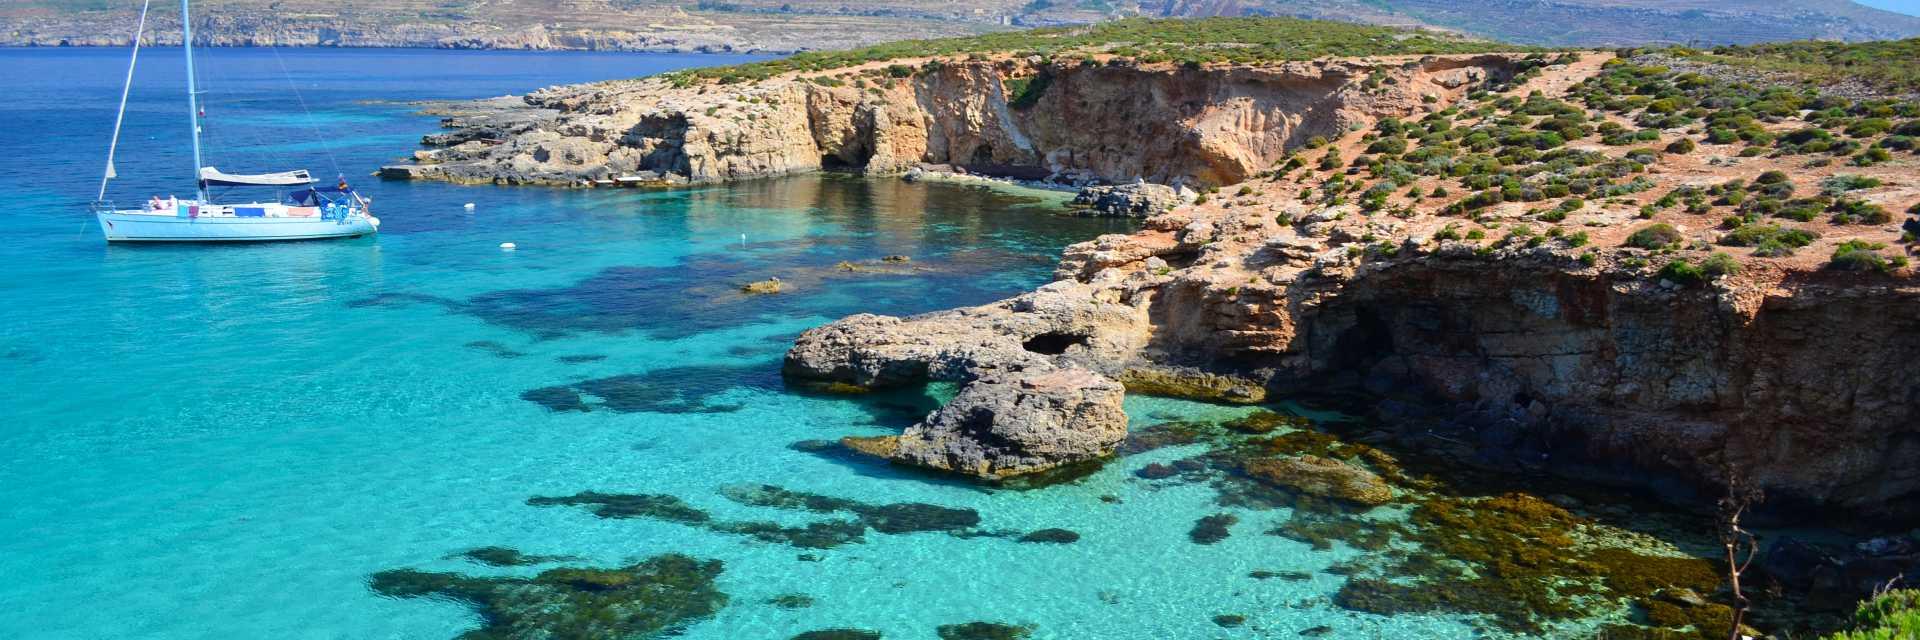 ewakacje - Malta last minute